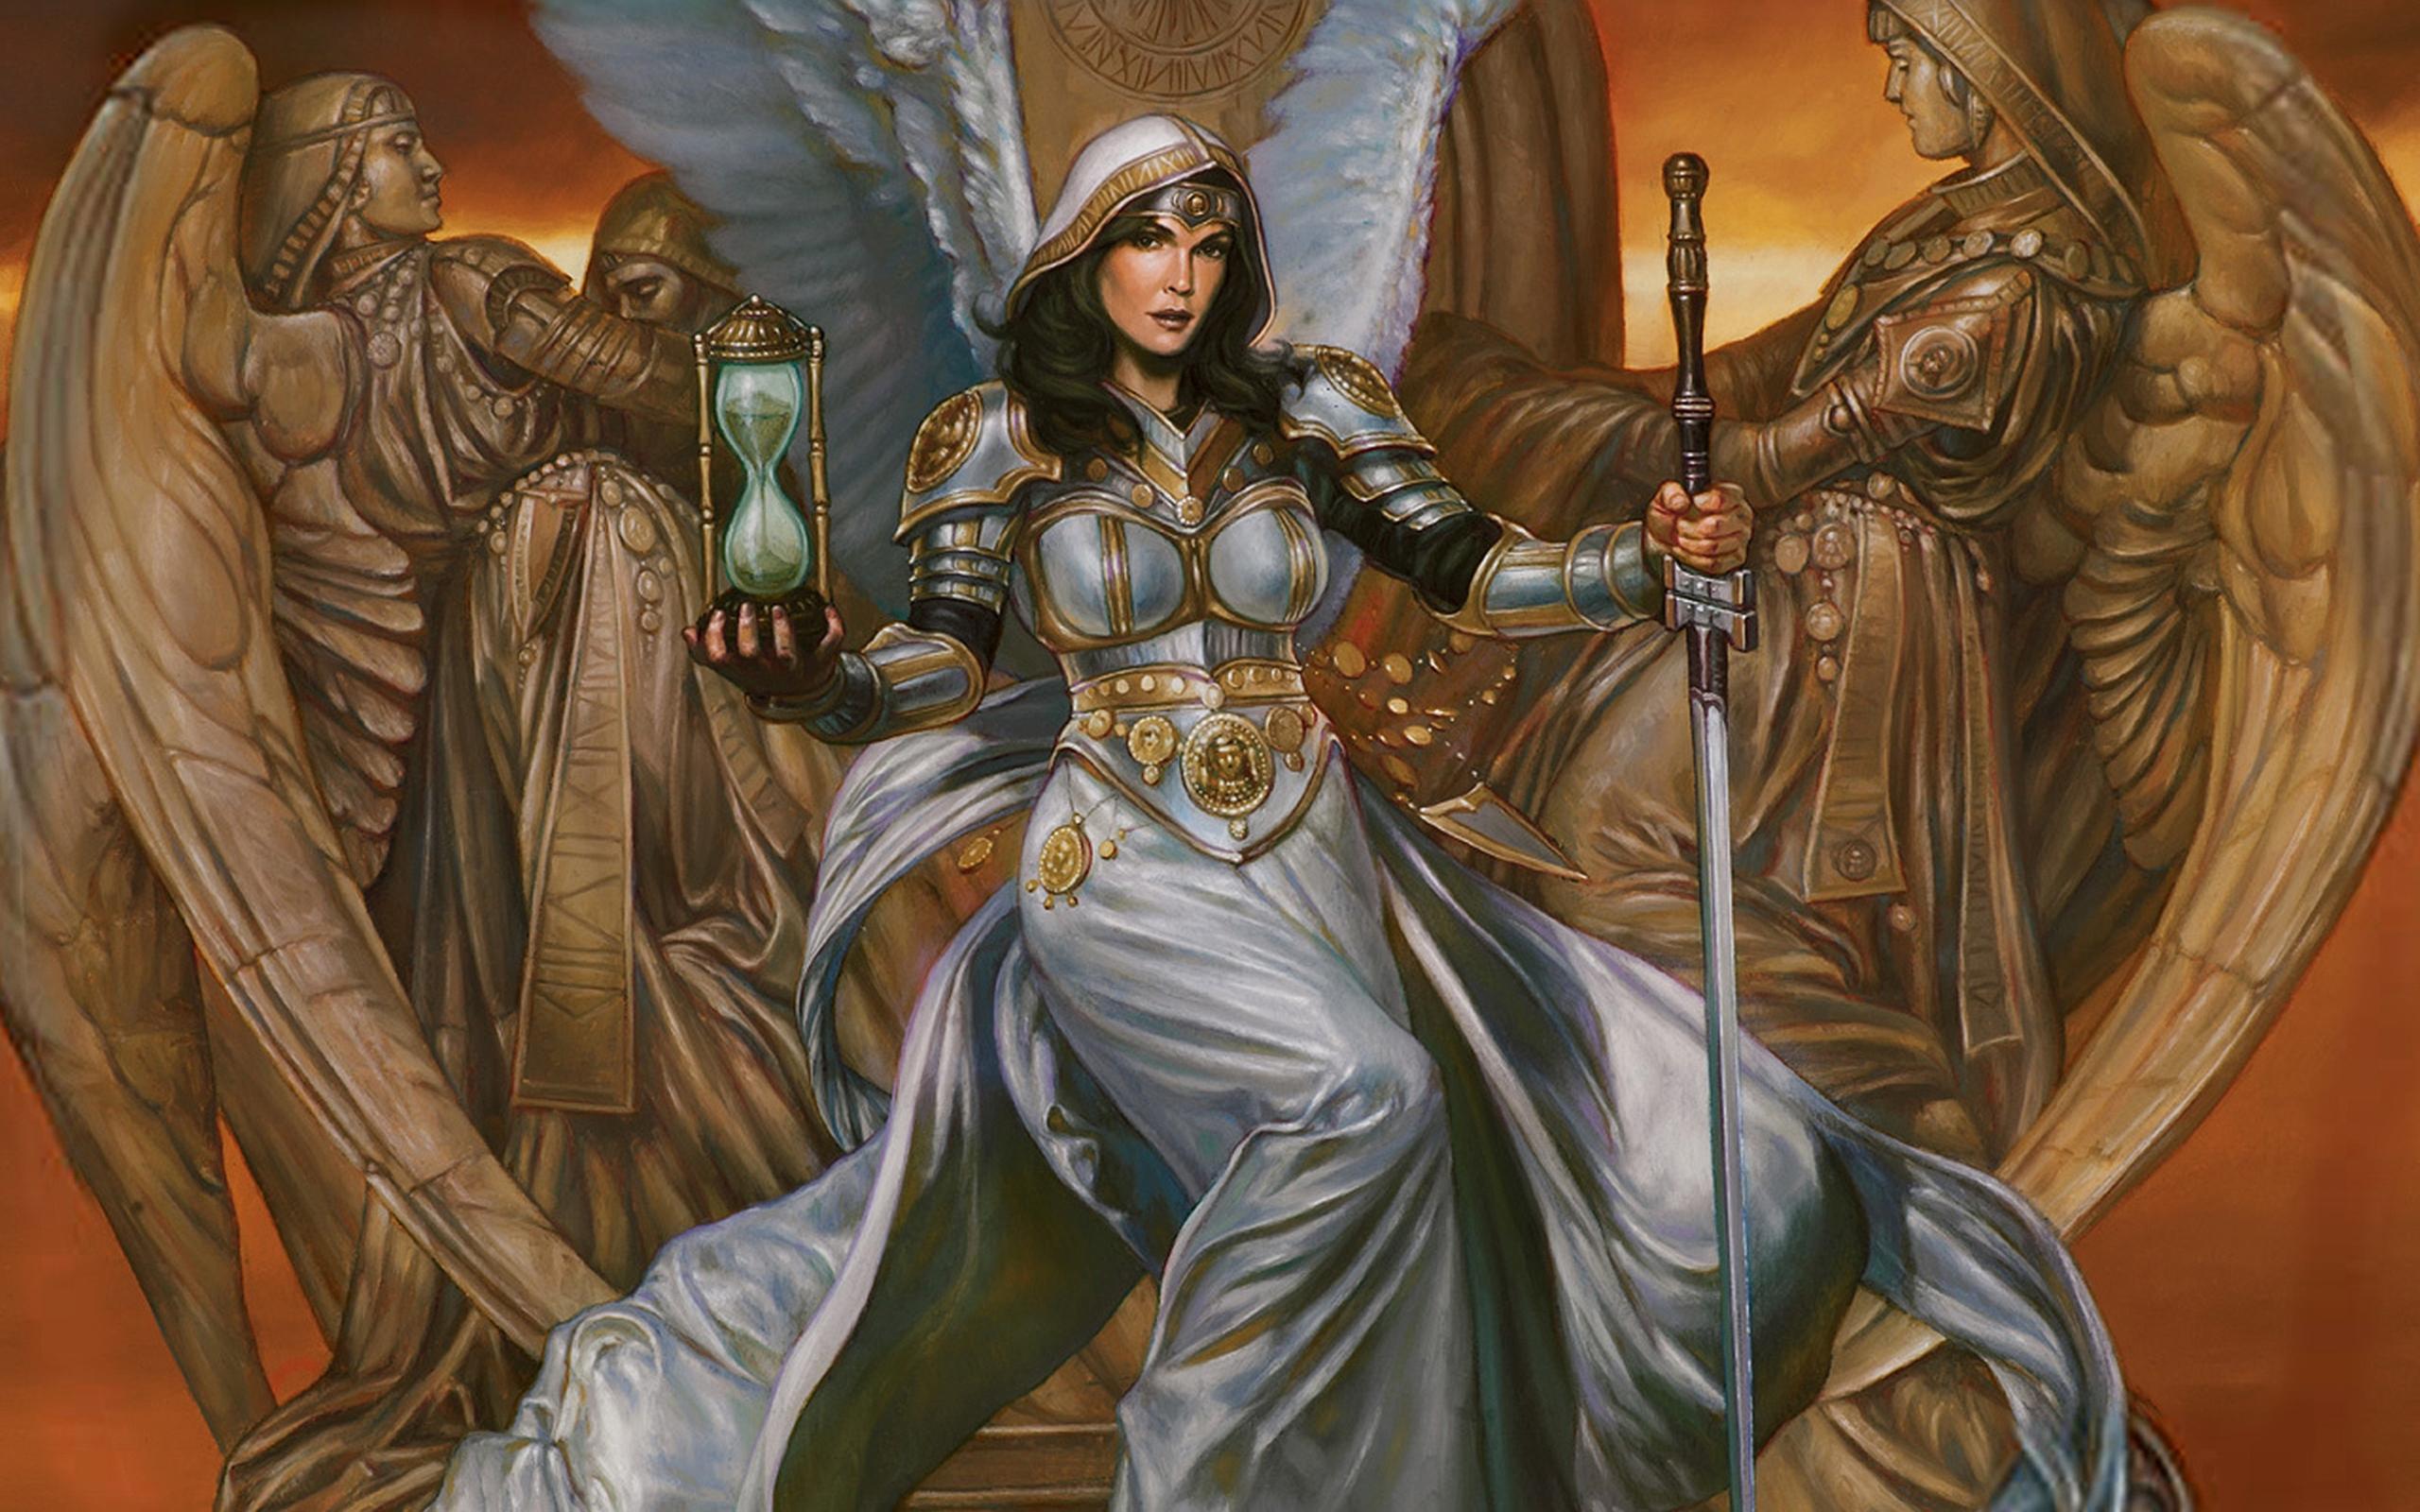 Stoic Angel Full Hd Wallpaper And Hintergrund 2560x1600